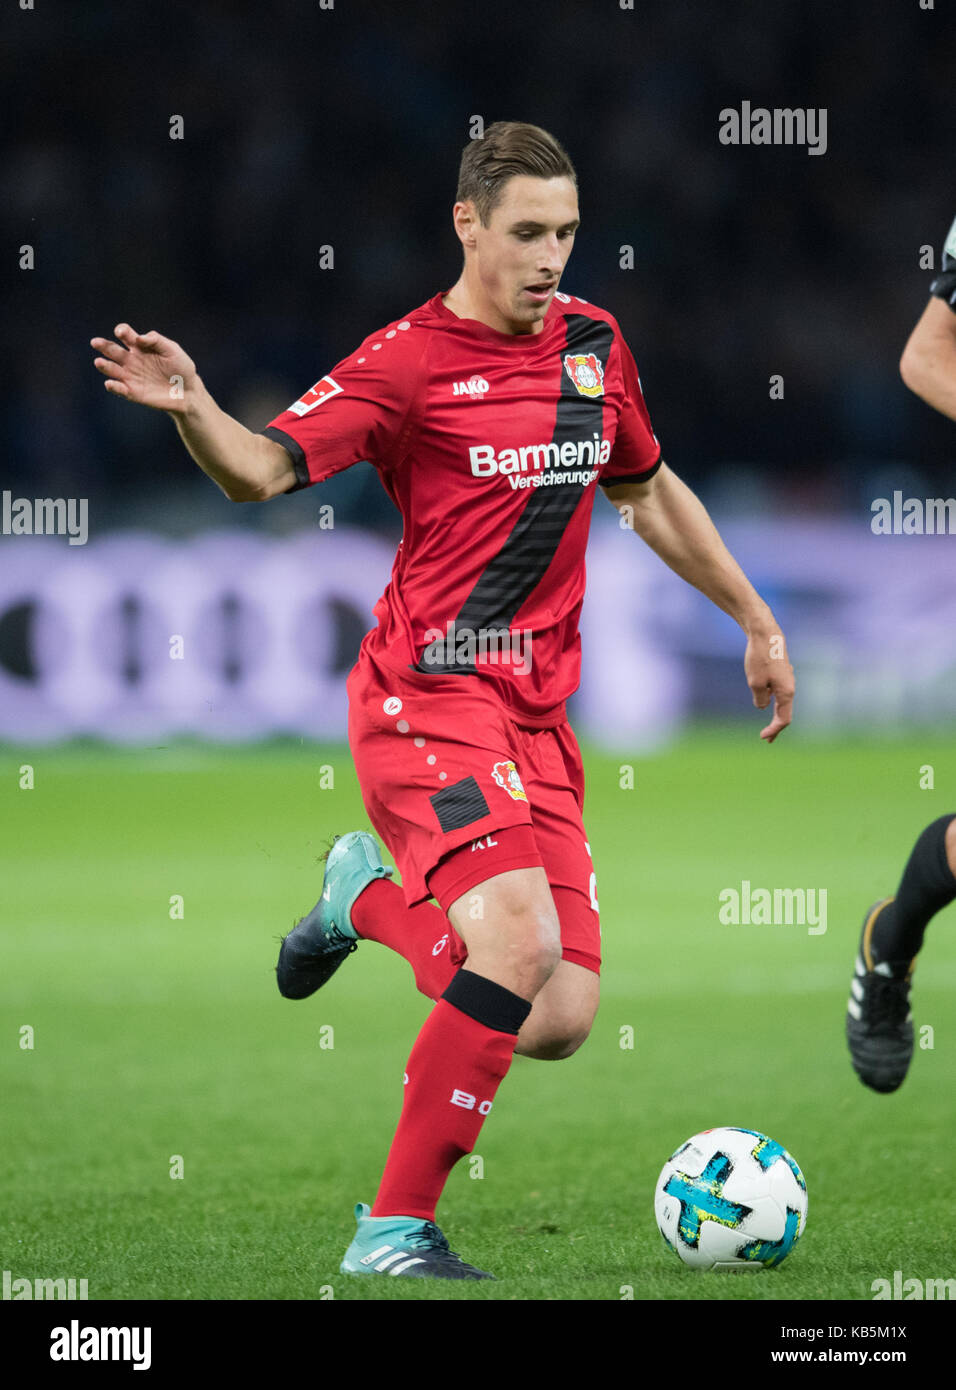 Berlin, Deutschland. 20th Sep, 2017. Dominik KOHR (LEV) Fussball 1. Bundesliga, 5. Spieltag, Hertha BSC Berlin (B) - Stock Image